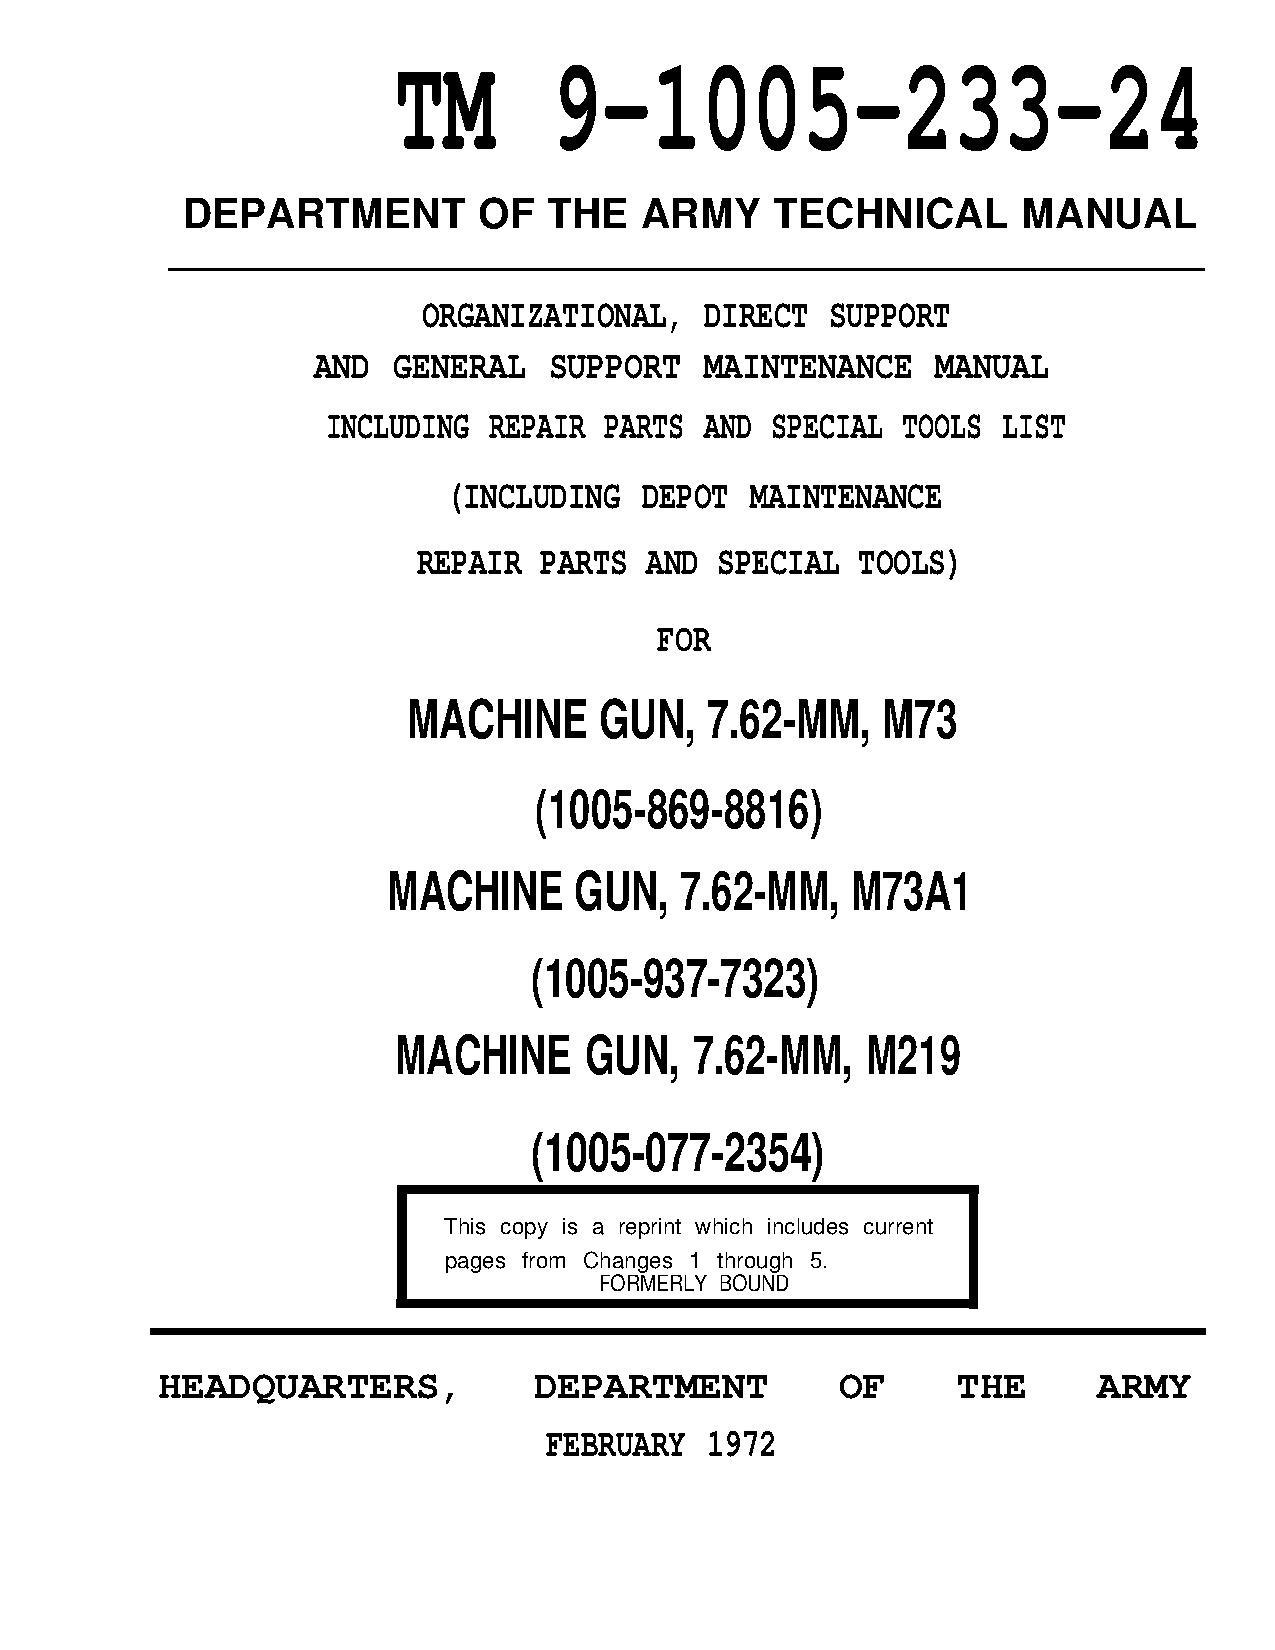 File:TM-9-1005-233-24.pdf - Wikimedia Commons